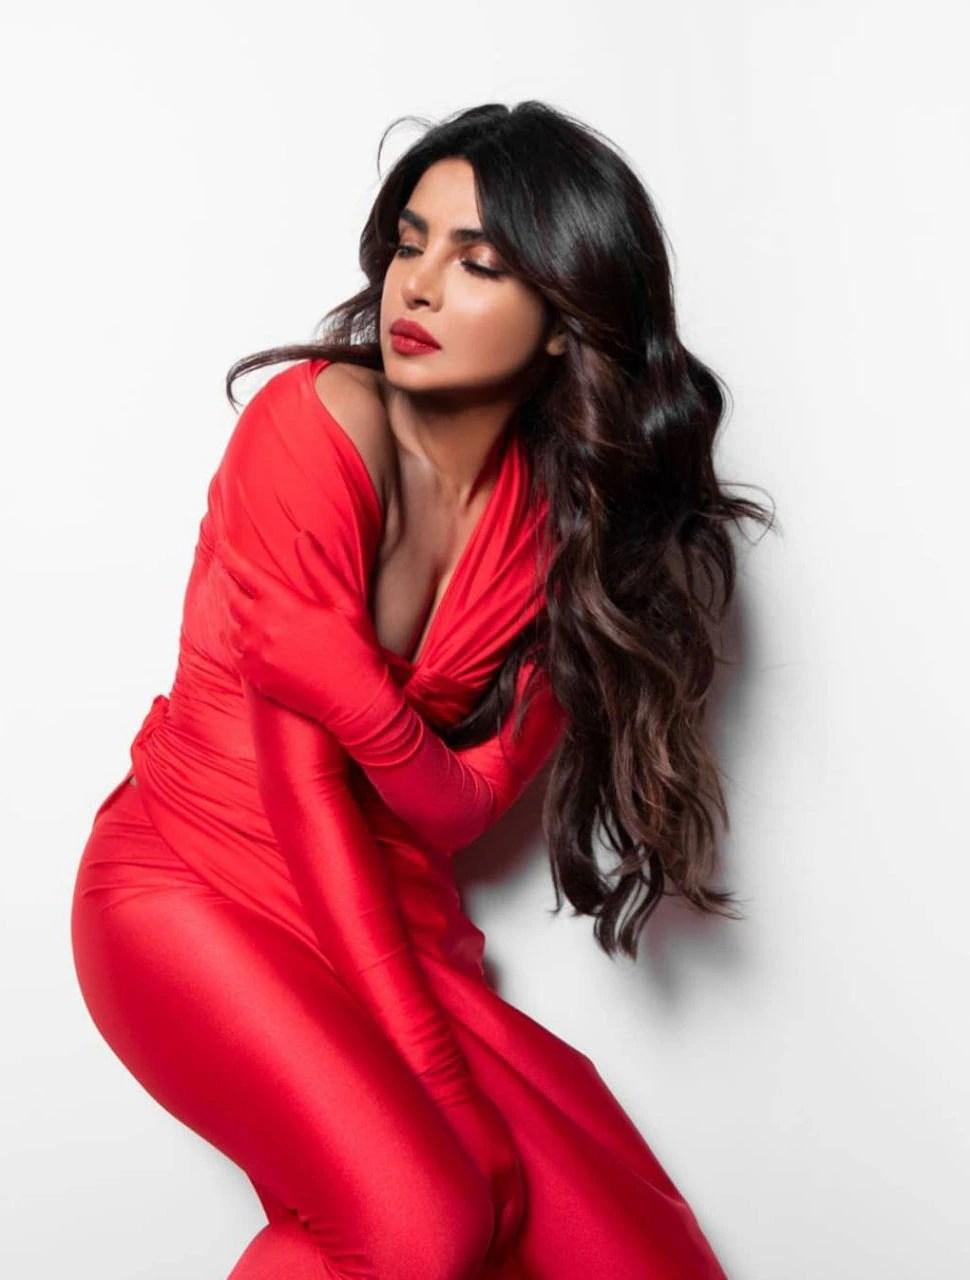 Priyanka Chopra Jonas trending image